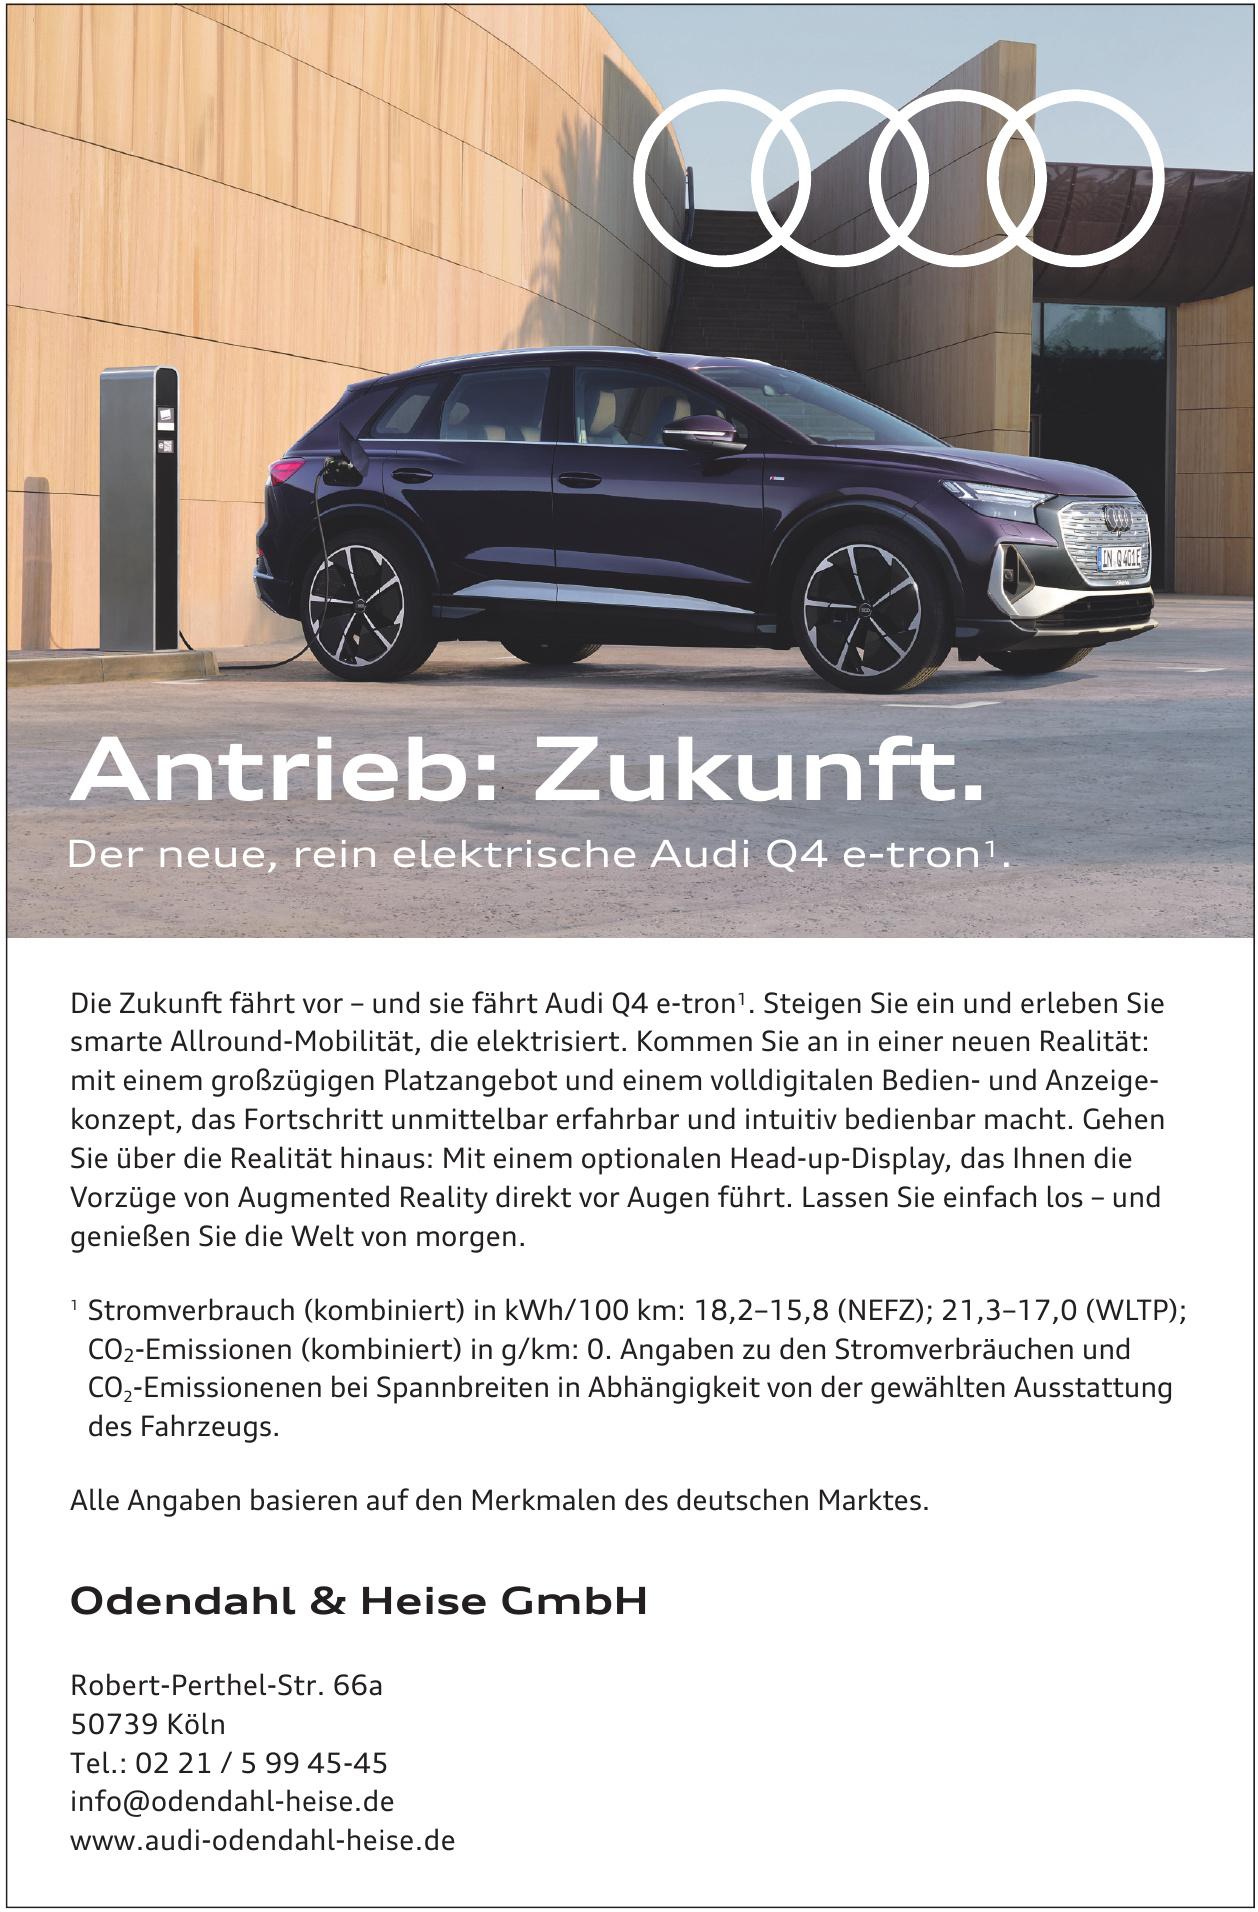 Odendahl & Heise GmbH